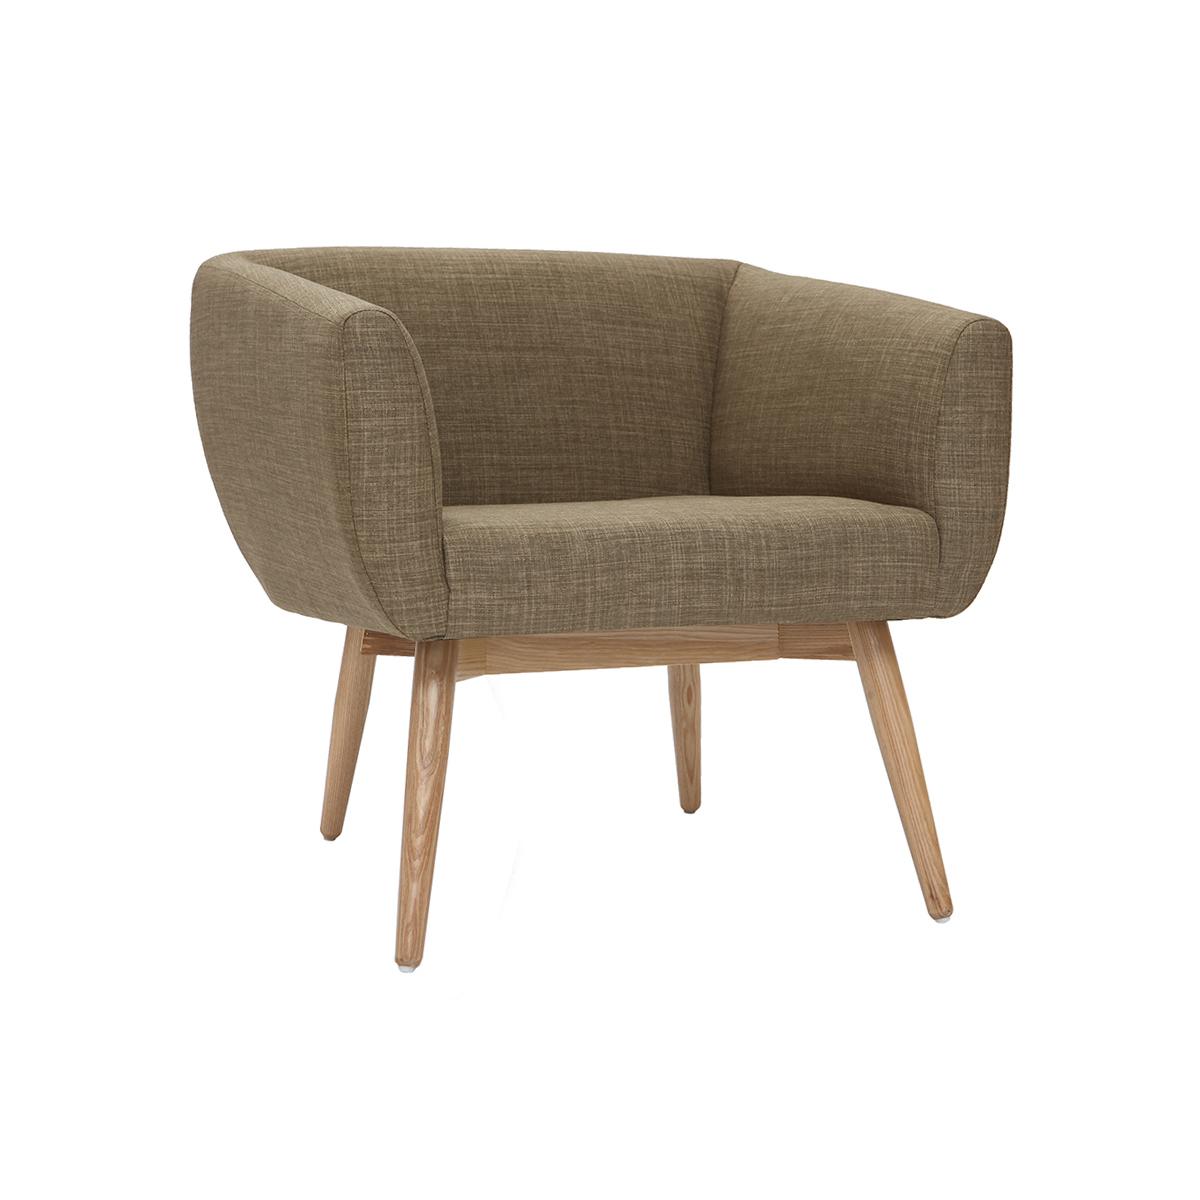 Poltrona design seduta in tessuto color verde oliva - ARTIK